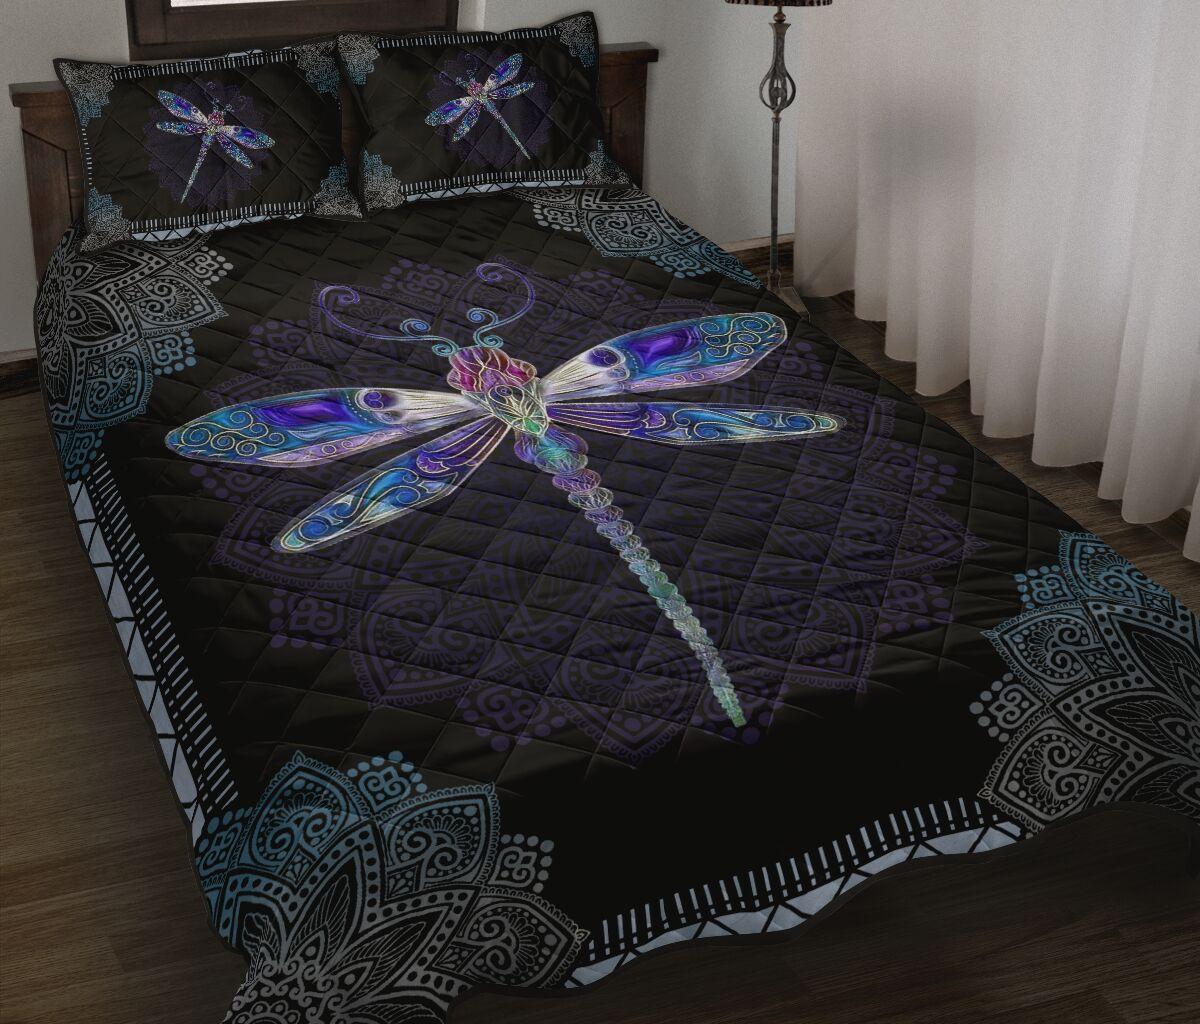 mandala version dragonfly full over print quilt 2